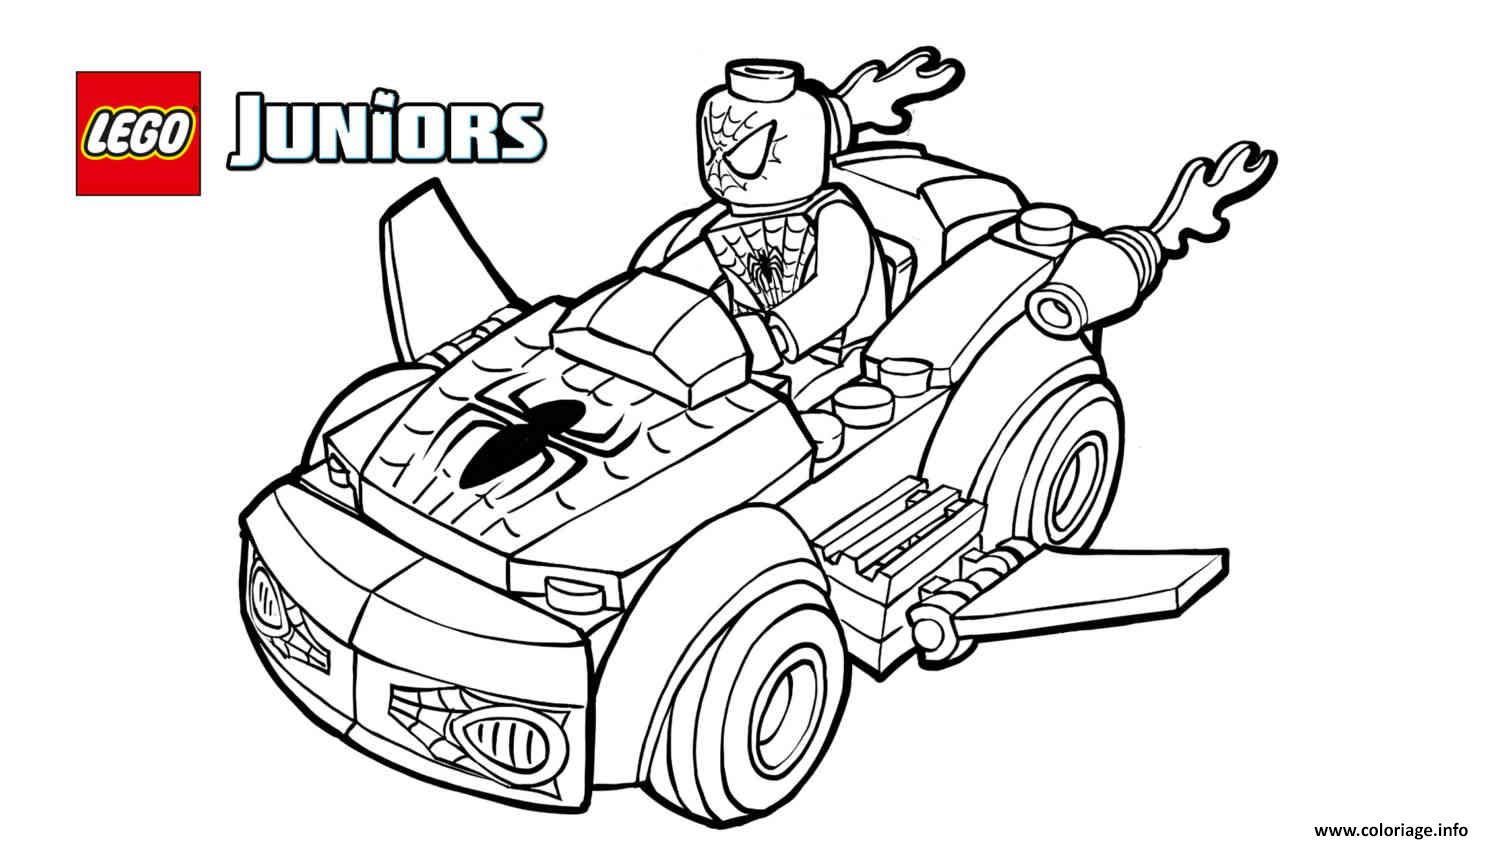 coloriage lego spiderman 2 voiture lego dessin imprimer - Coloriage Lego